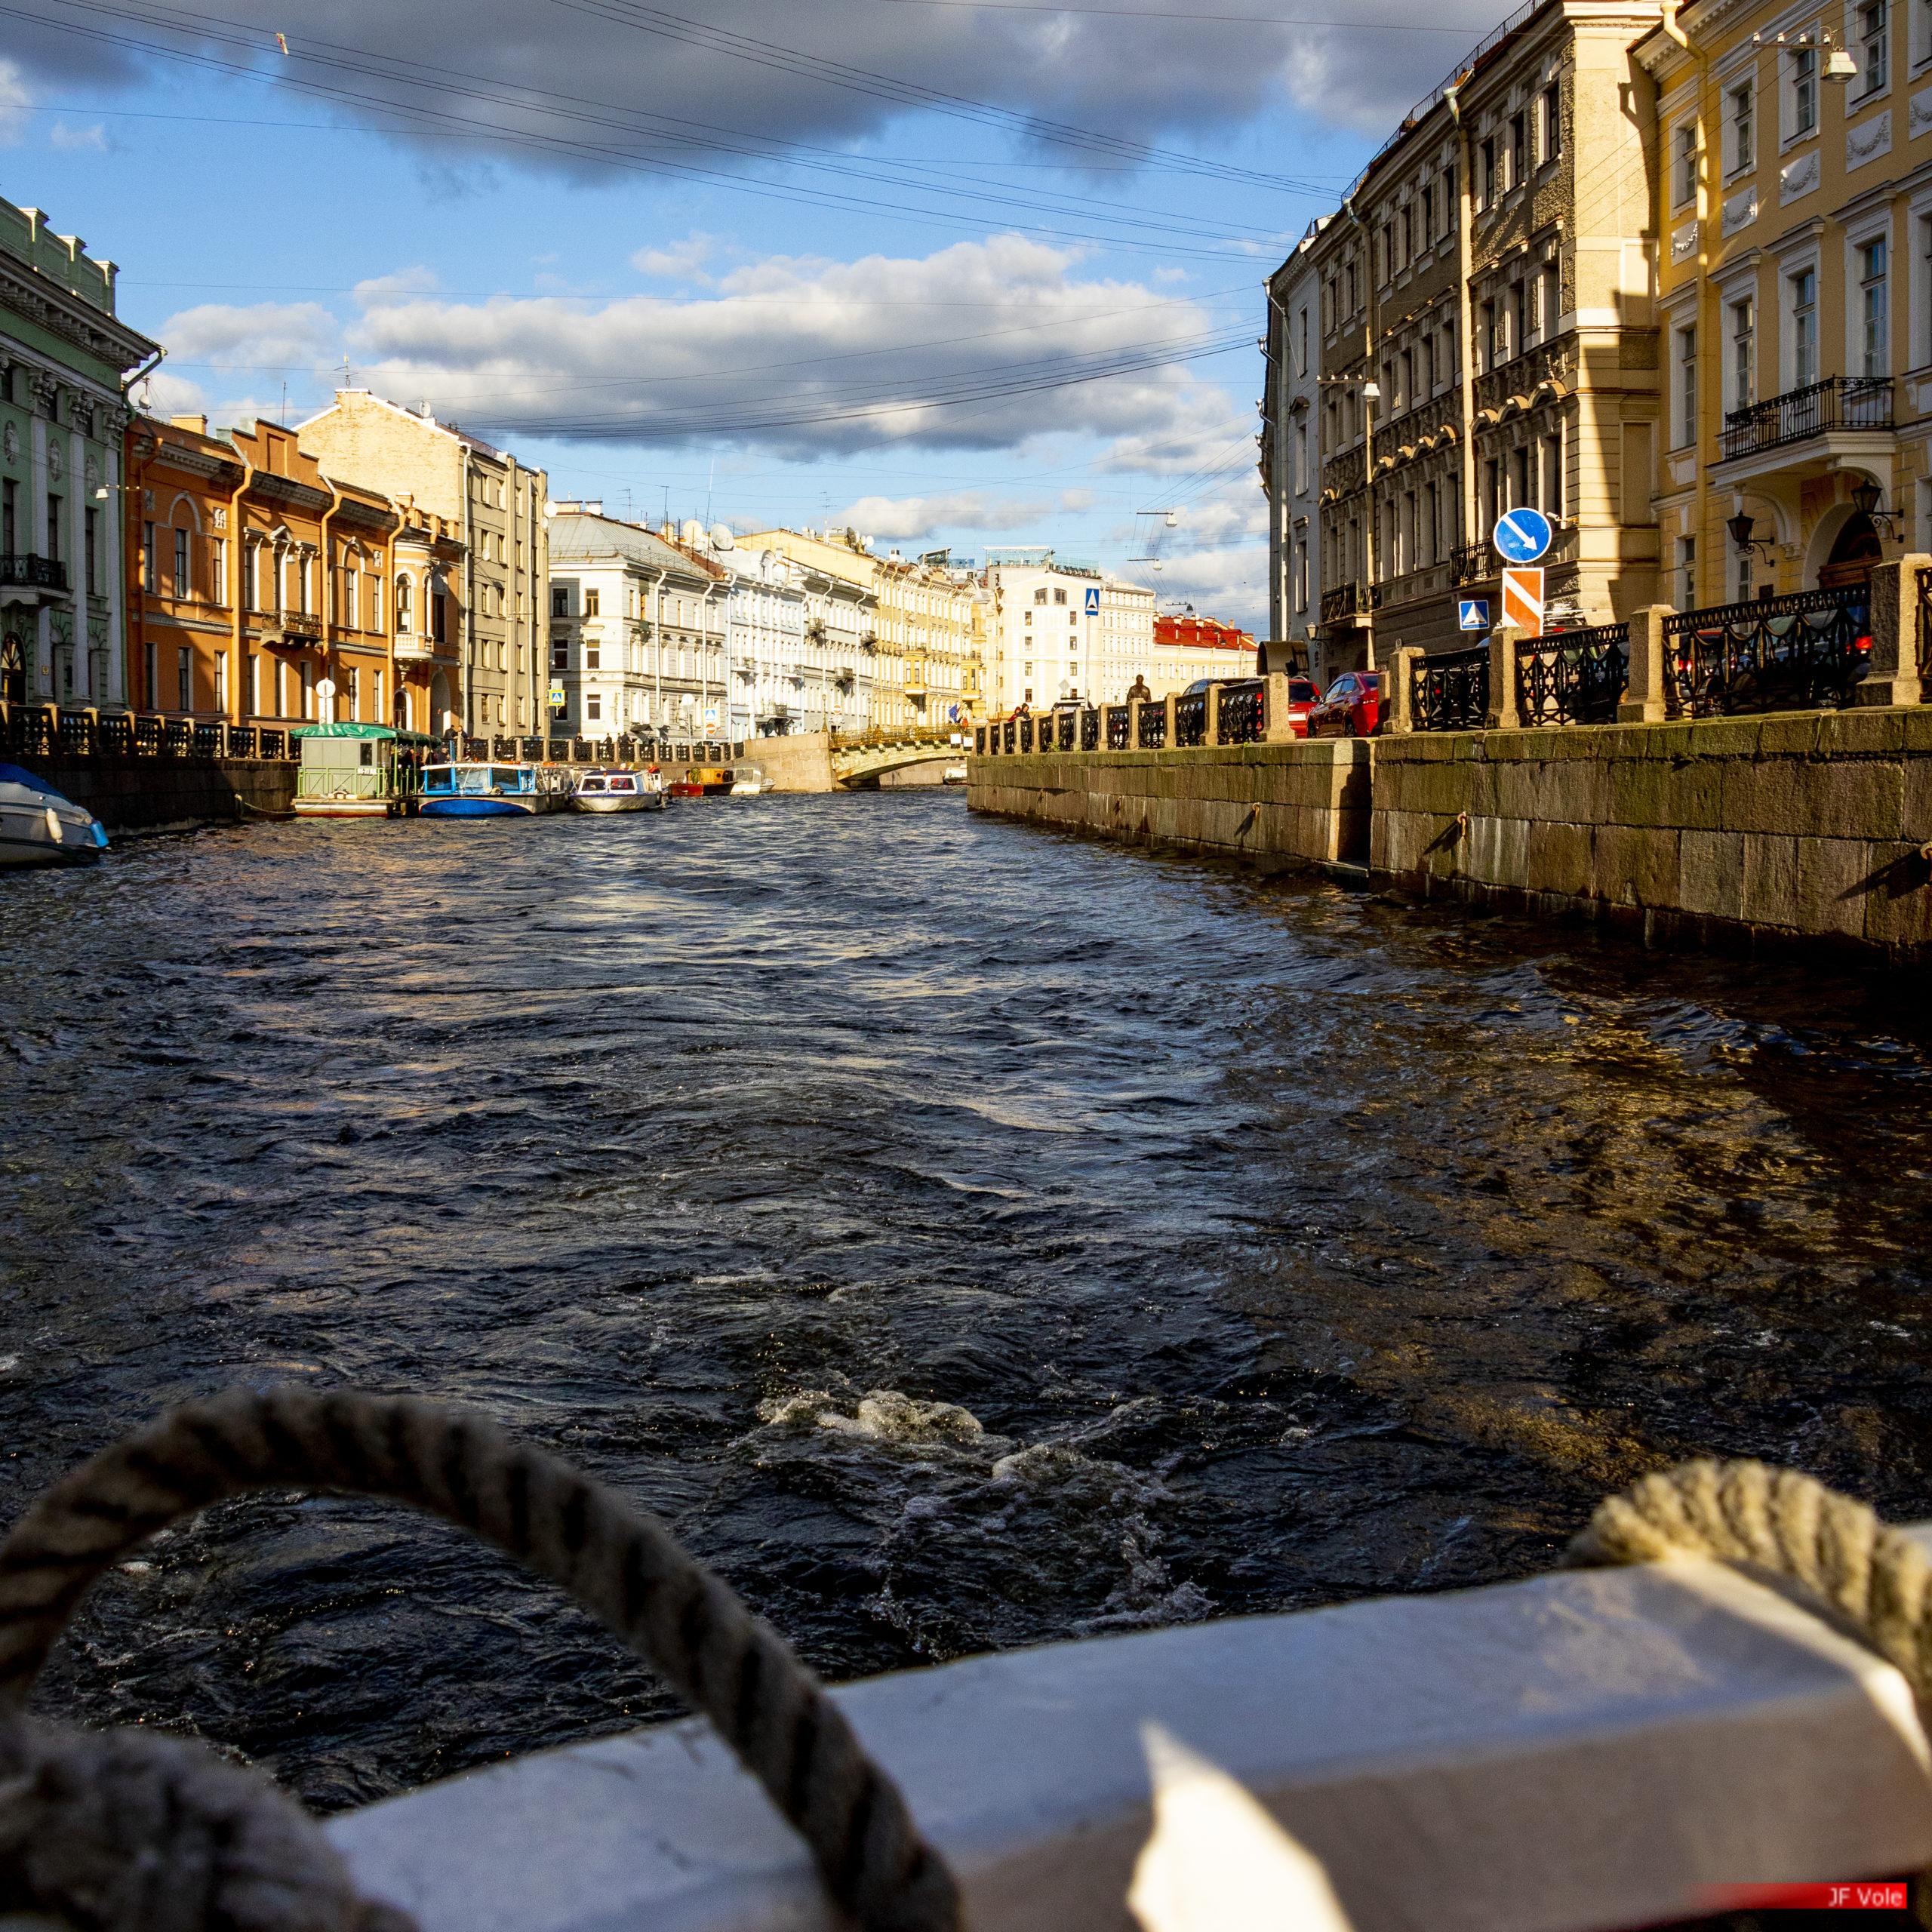 Moïka, Saint-Pétersbourg. Septembre 2018.